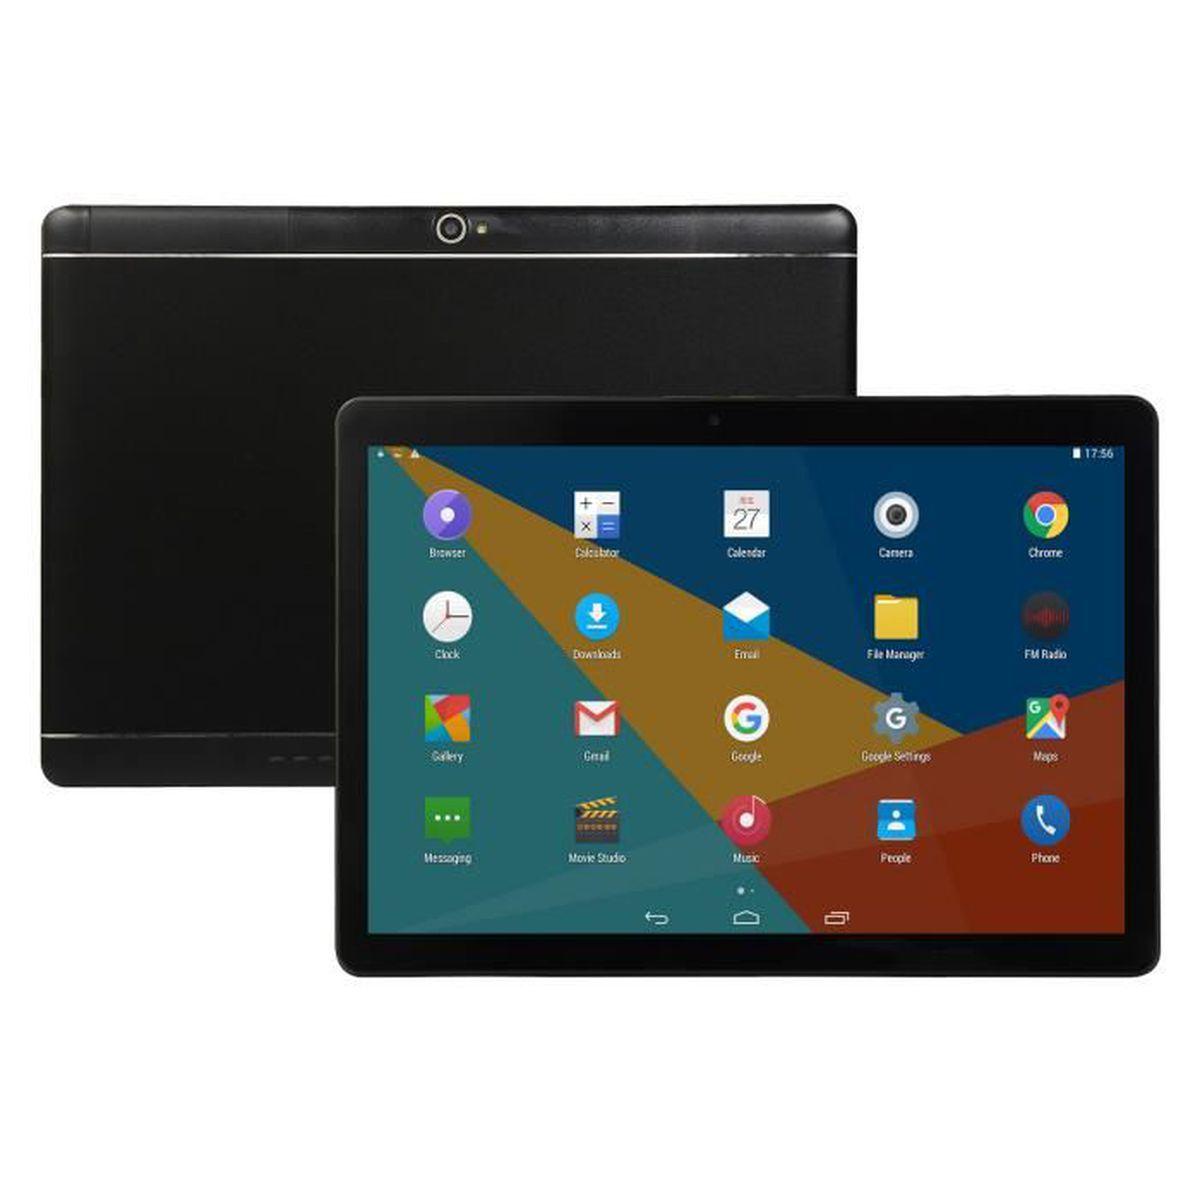 TABLETTE TACTILE Tablette 10,1 pouces Android 8.0 Bluetooth PC 8 +